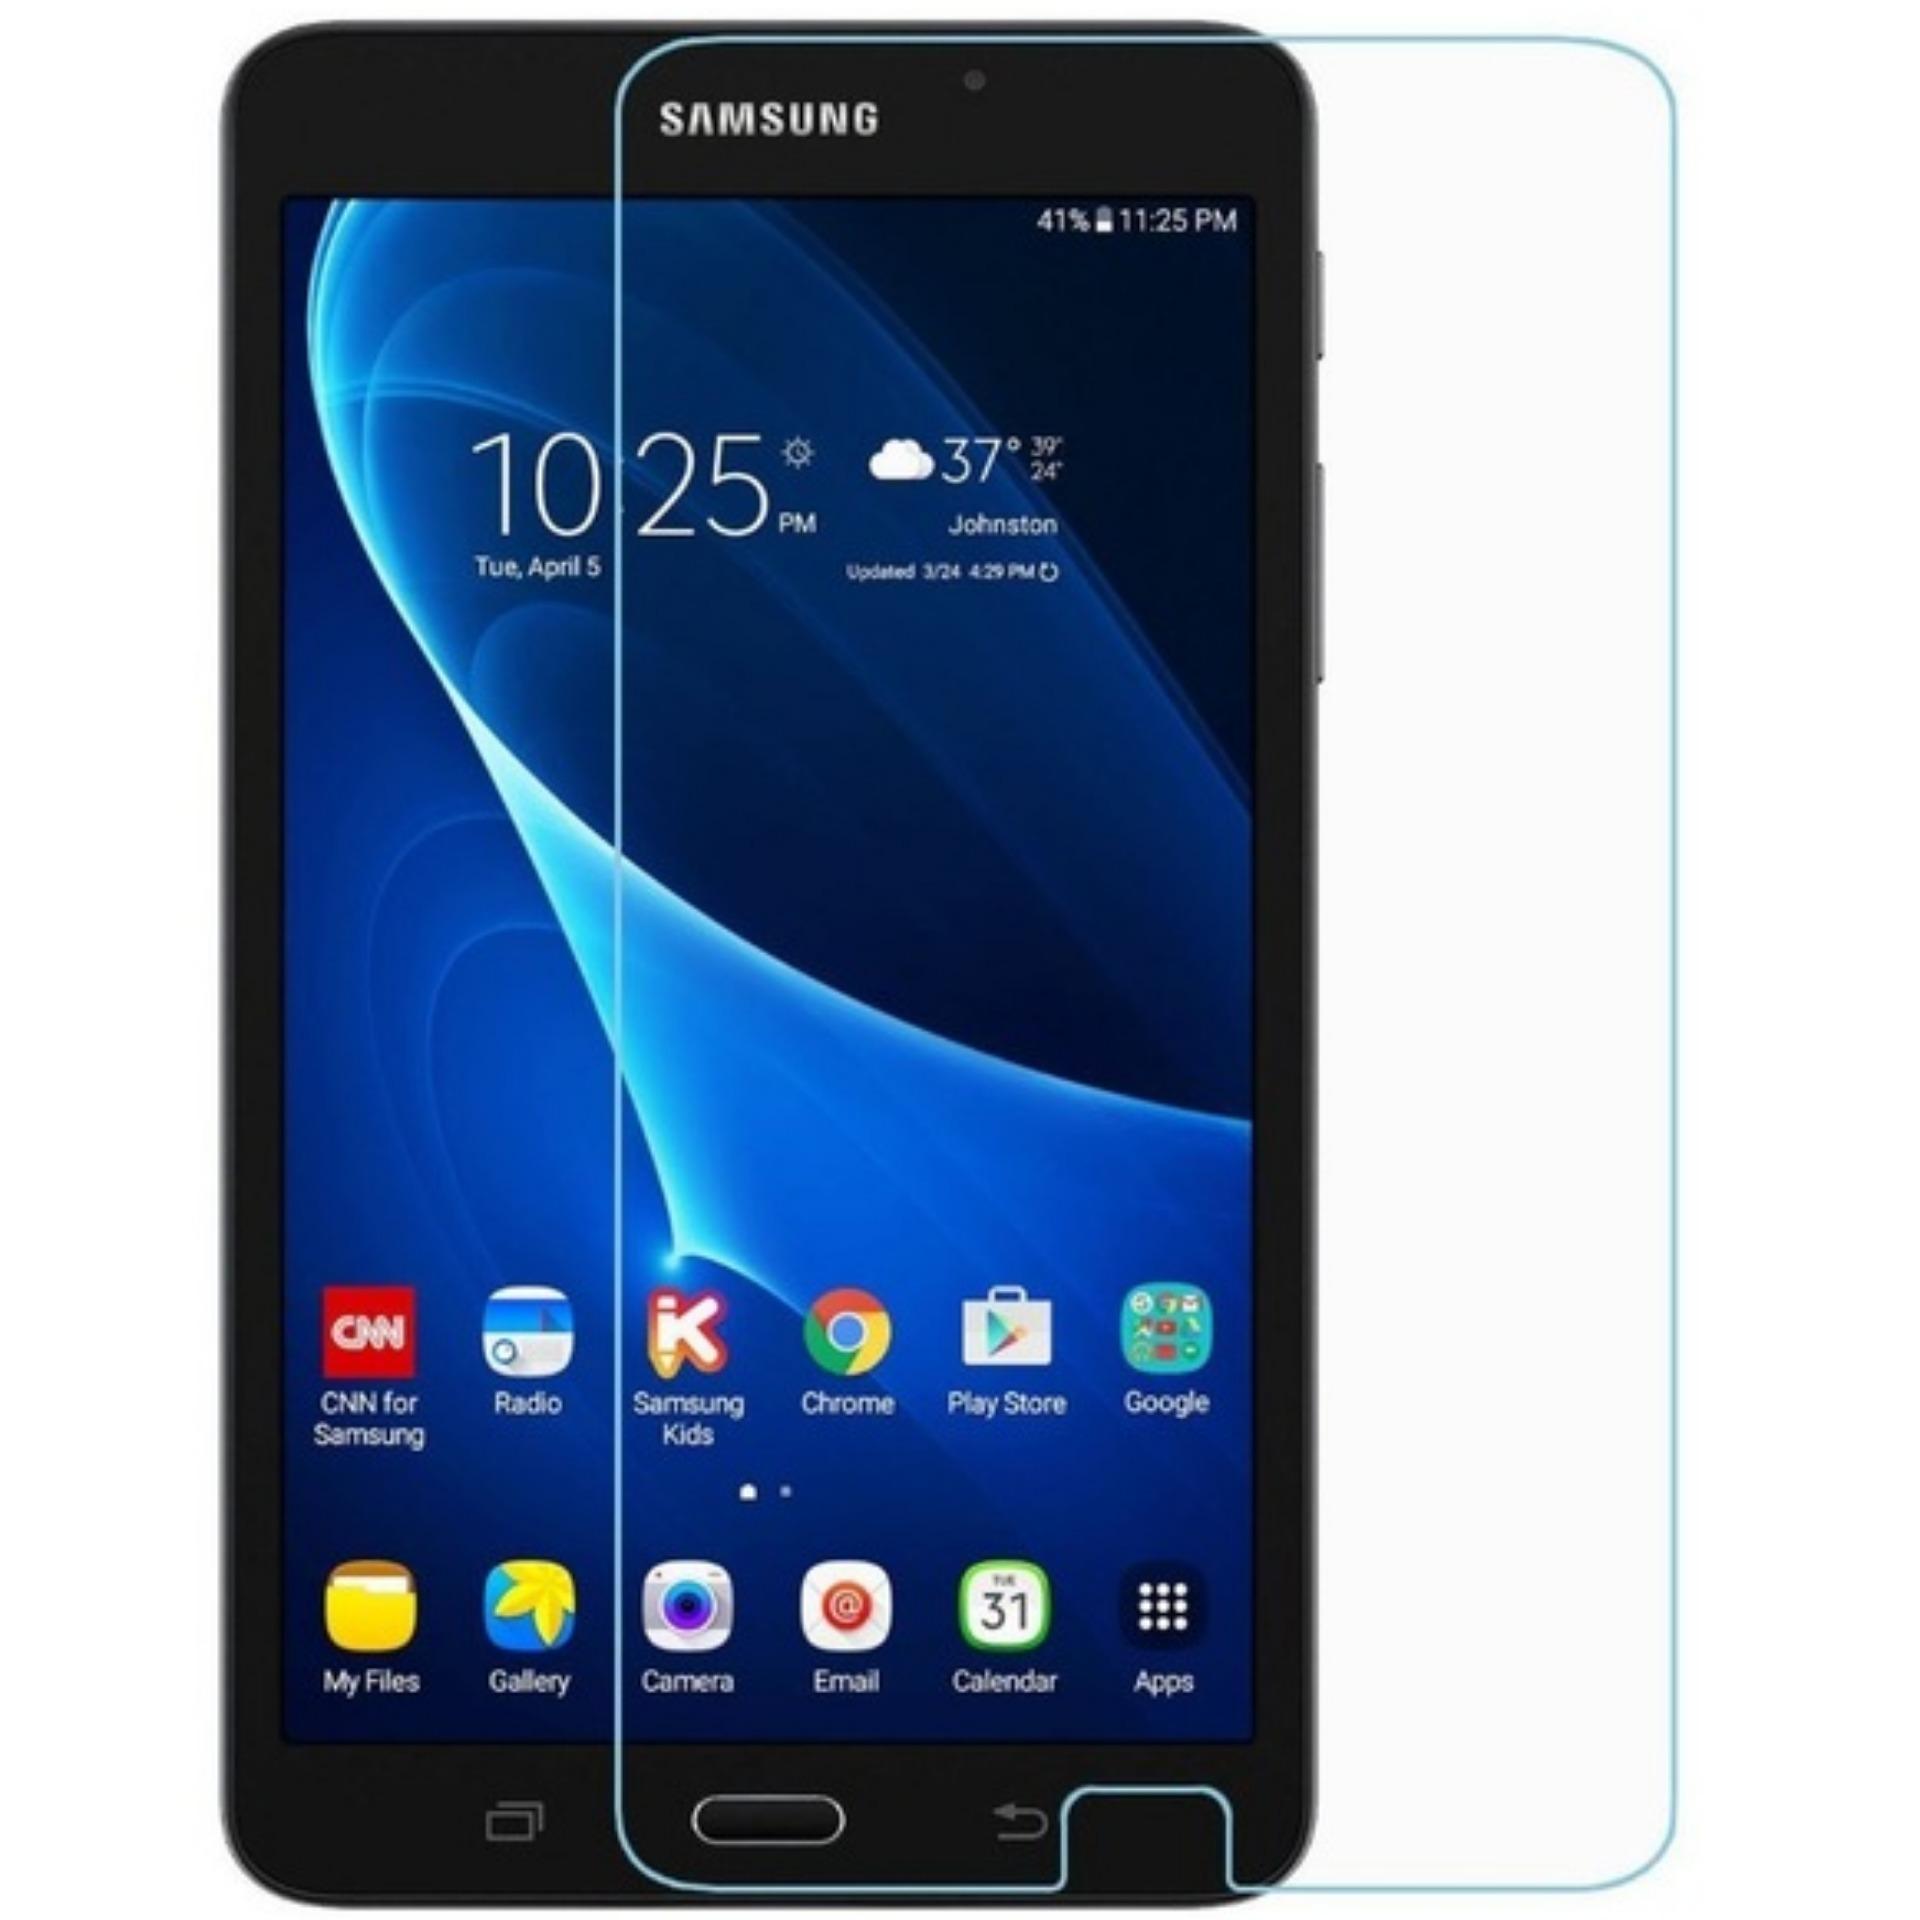 Vn Samsung Galaxy Tablet Tab A 7.0